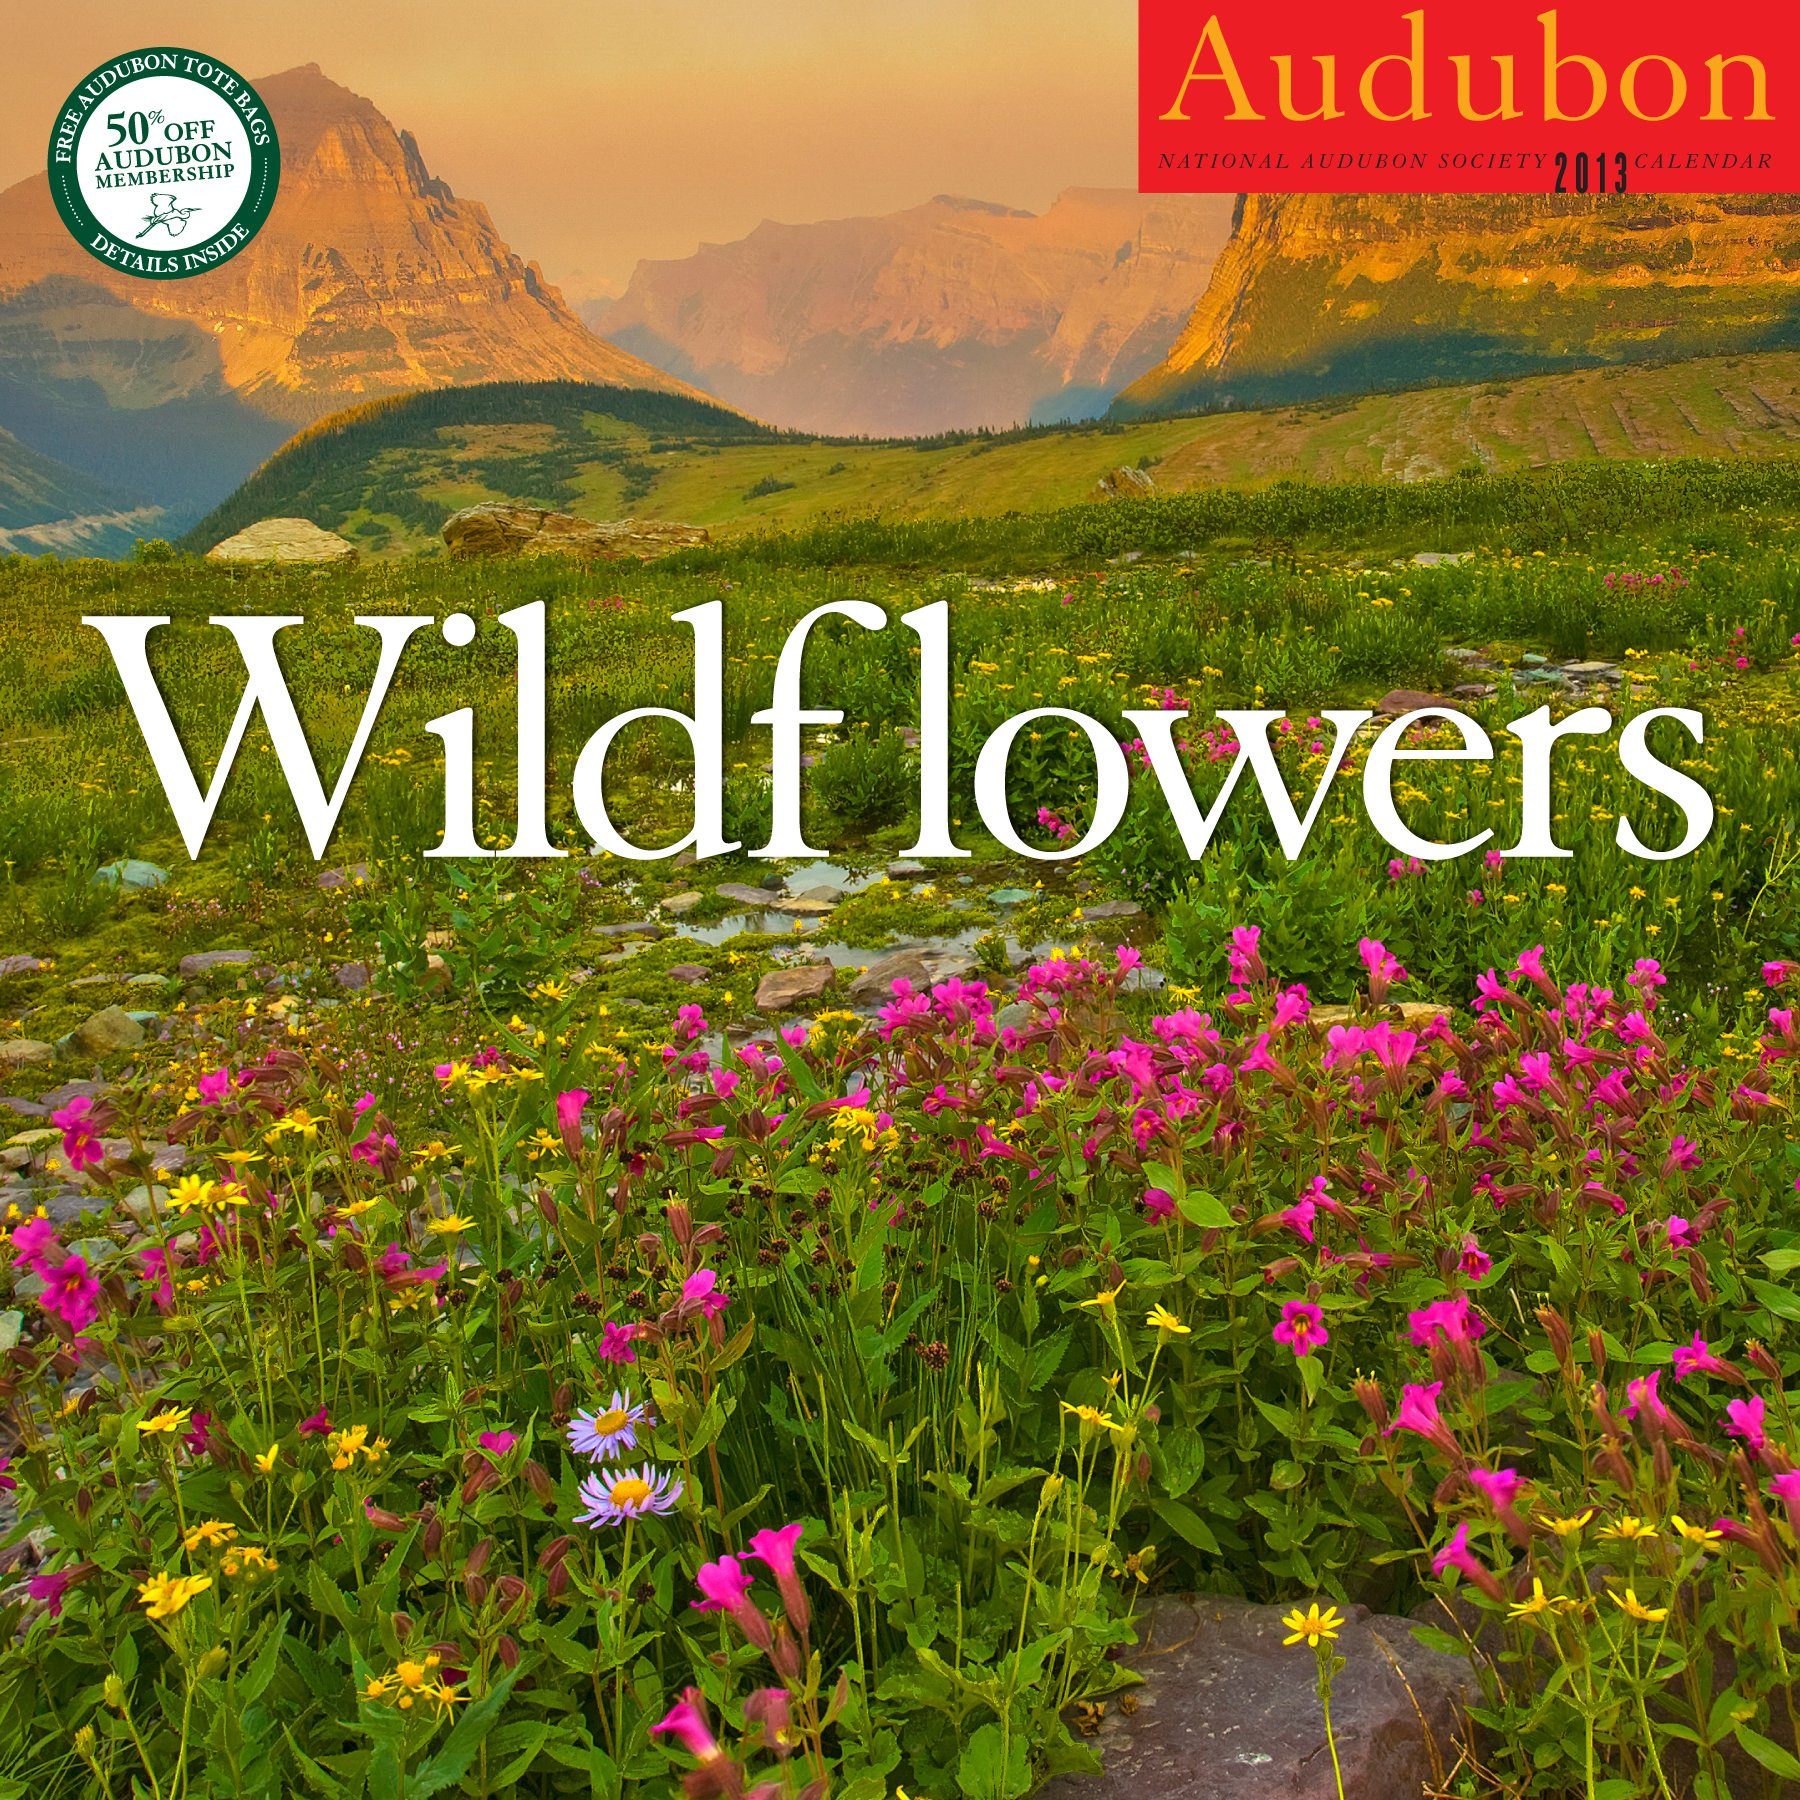 Amazon.com: AUDUBON WILDFLOWERS CALENDAR 2013 (9781579654863): National  Audubon Society: Books